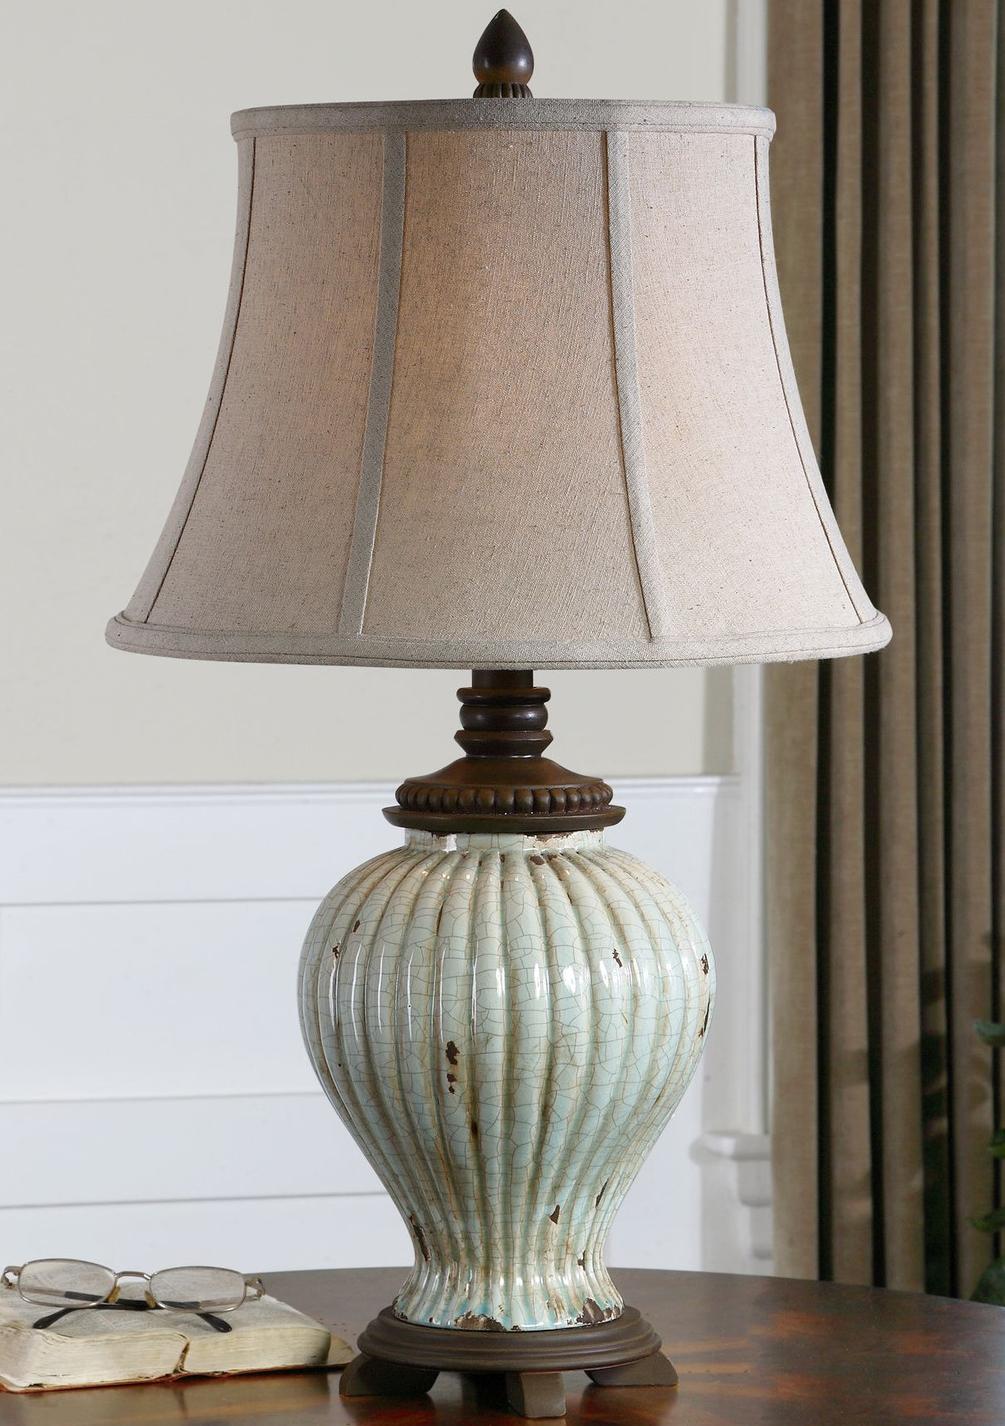 Dernice+Table+Lamp.jpg